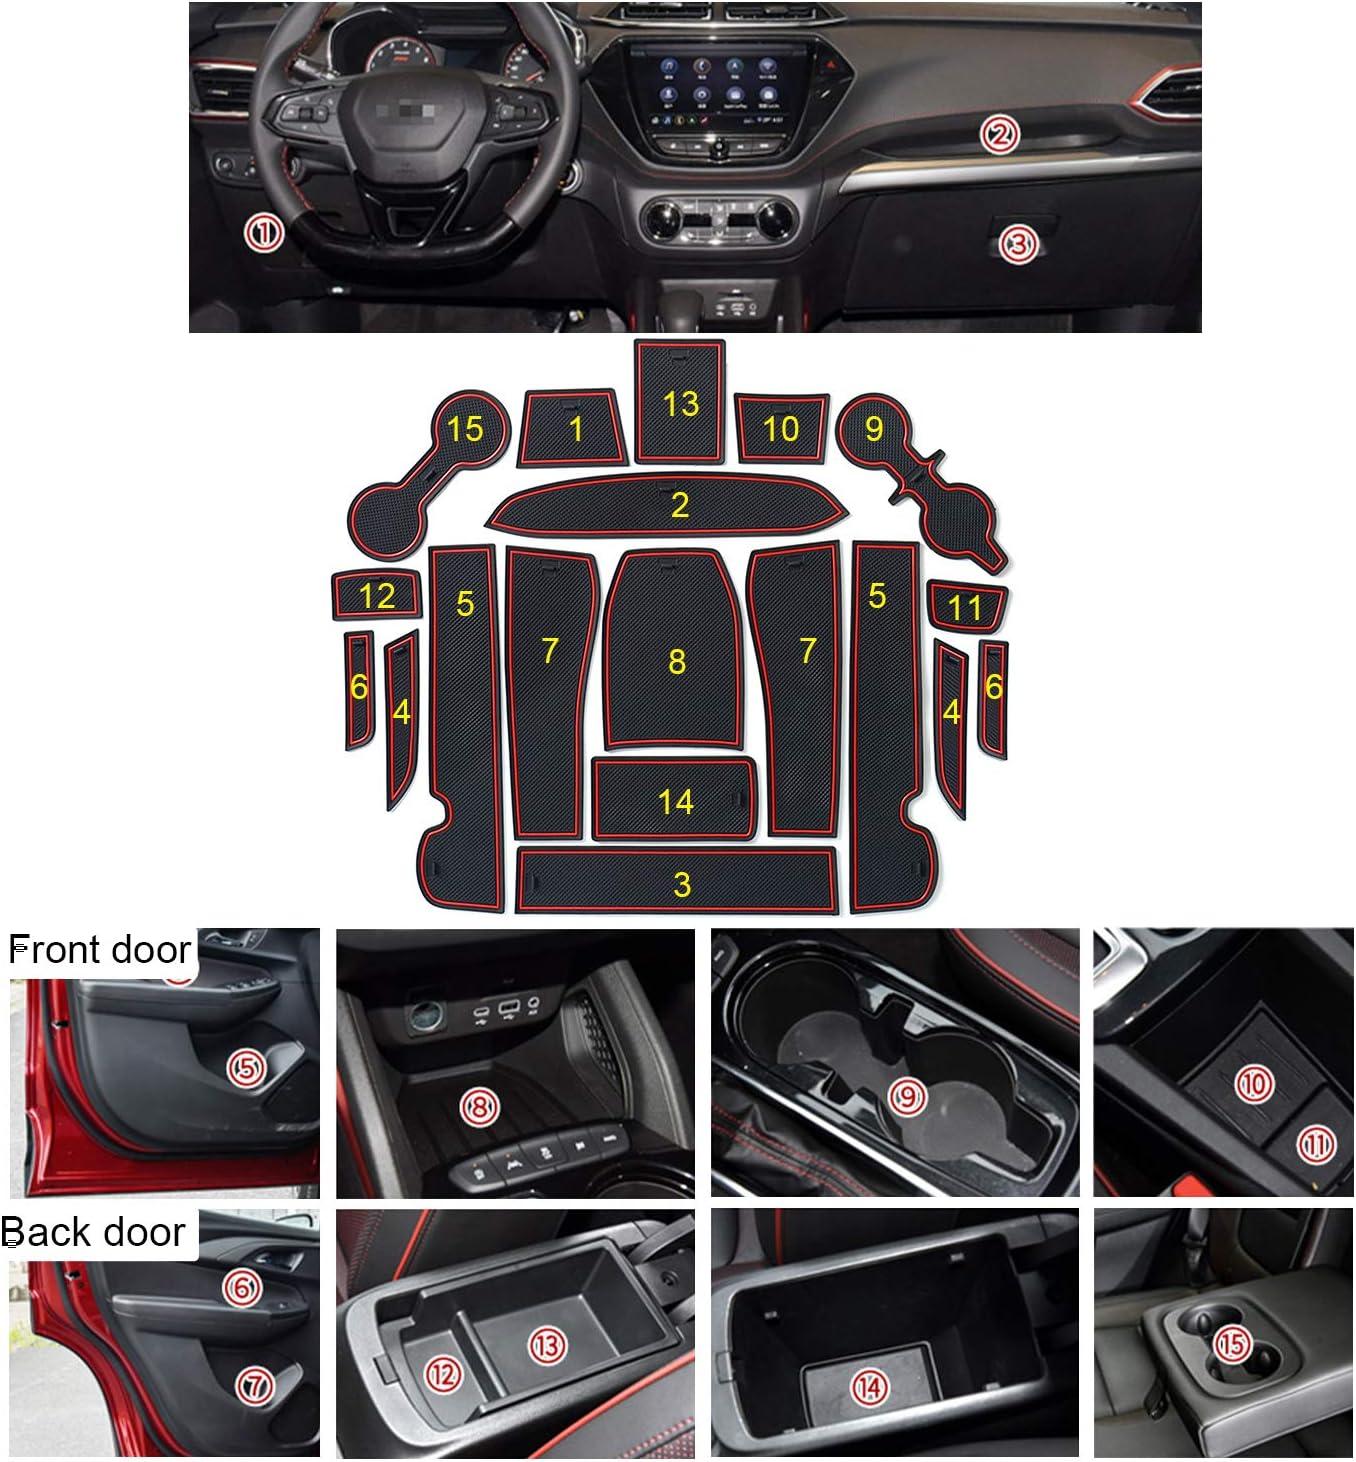 Cup Holder Pads Groove Mat Cushions Rubber Mat LFOTPP Car Non-Slip Interior Door Gate Slot Mats for 2021 Chevrolet Trailblazer Red